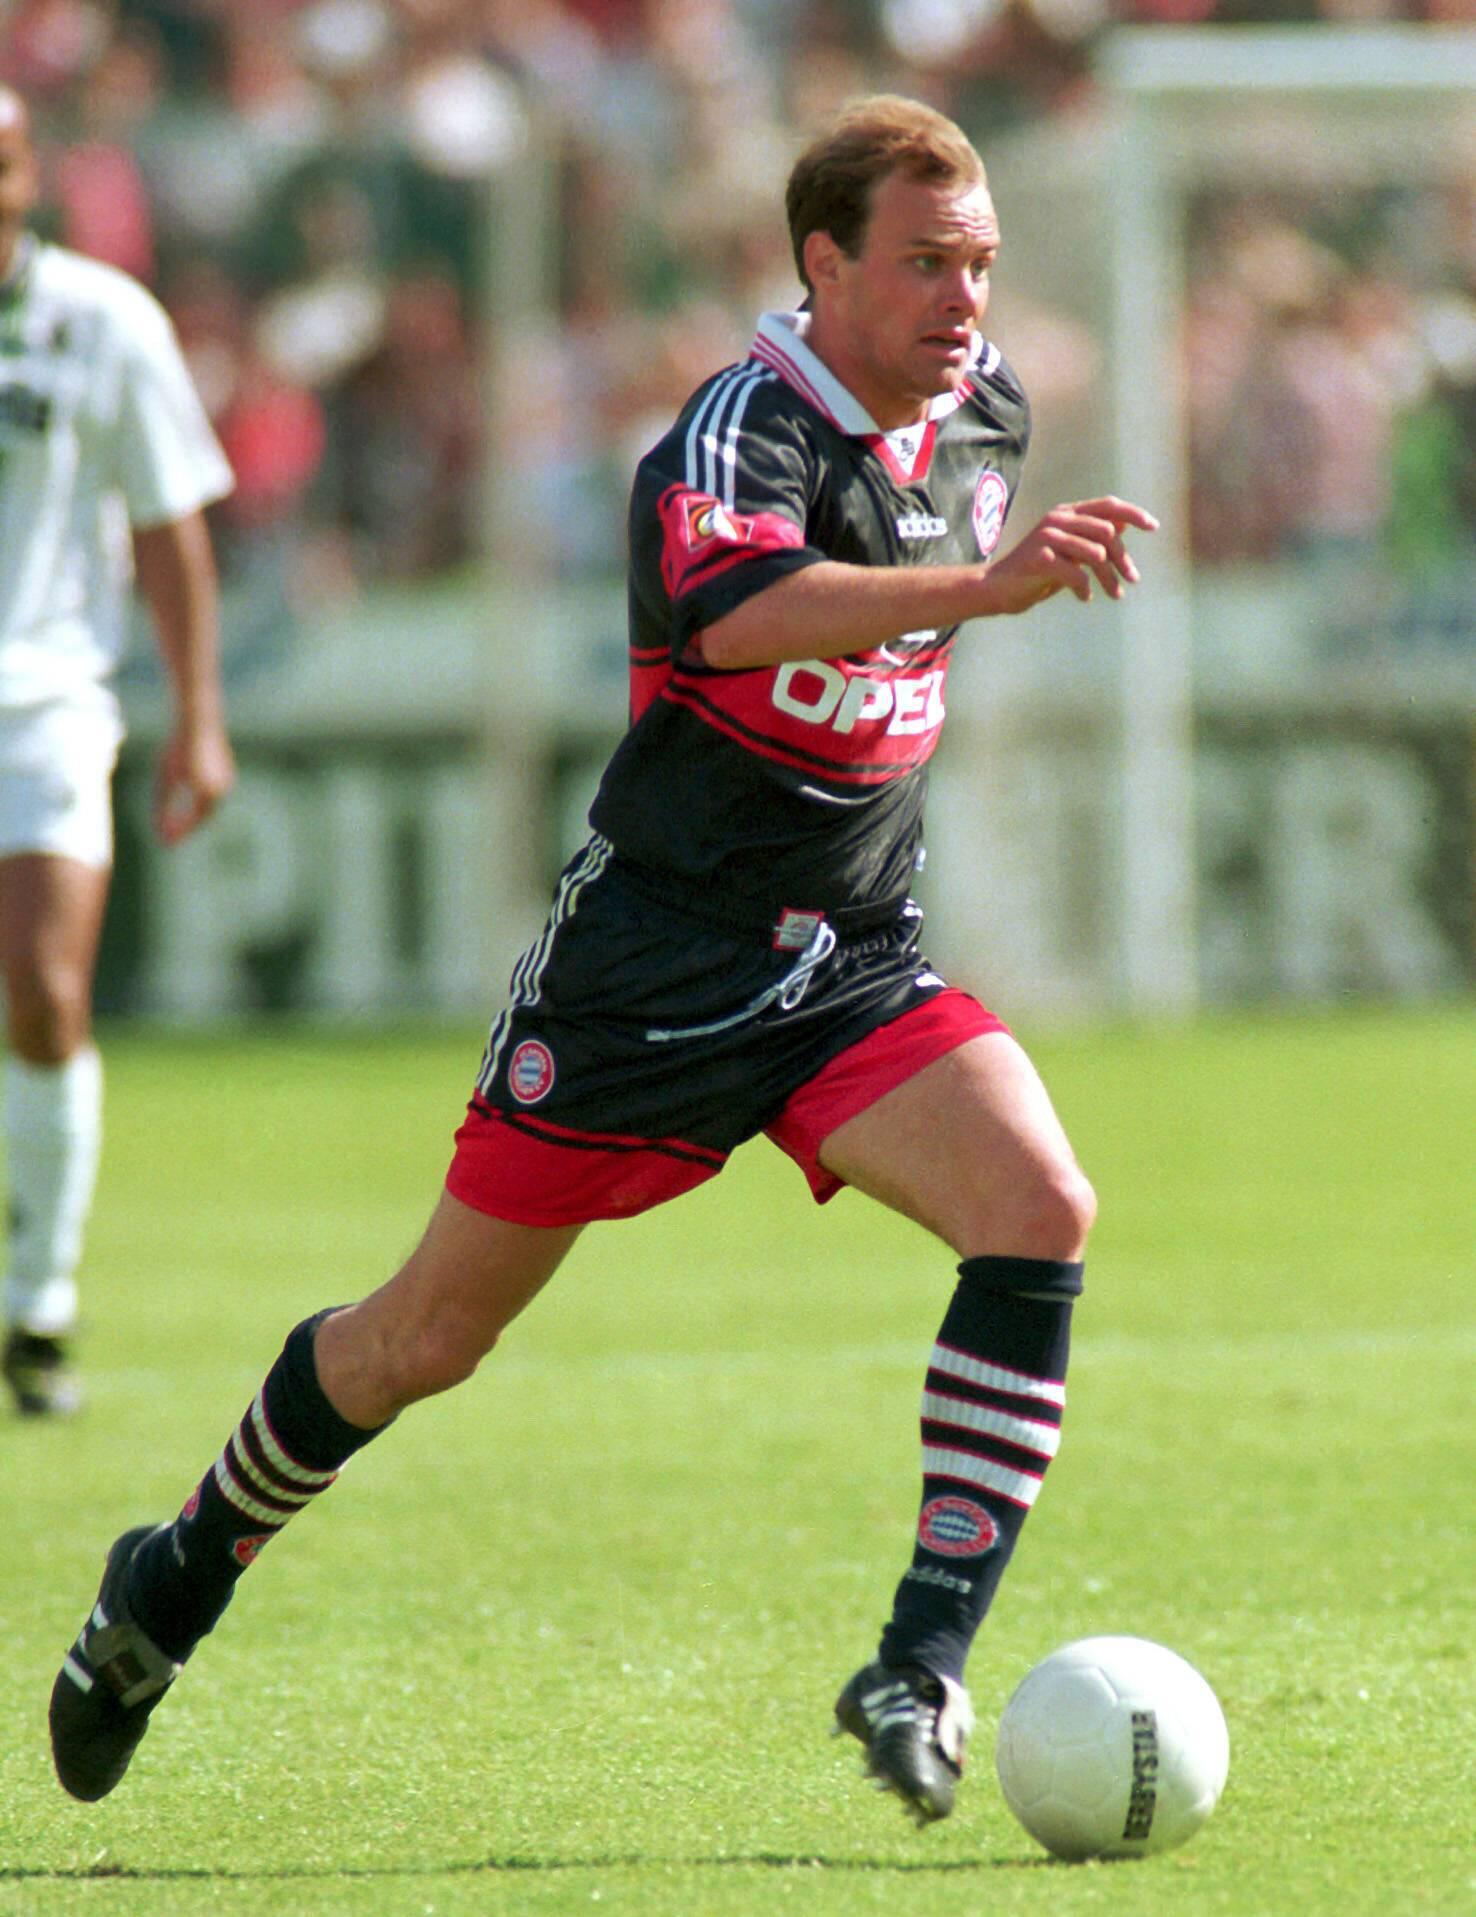 Bild zu Christian Nerlinger, FC Bayern München, Borussia Mönchengladbach, Bundesliga, Bökelberg, 1996/97